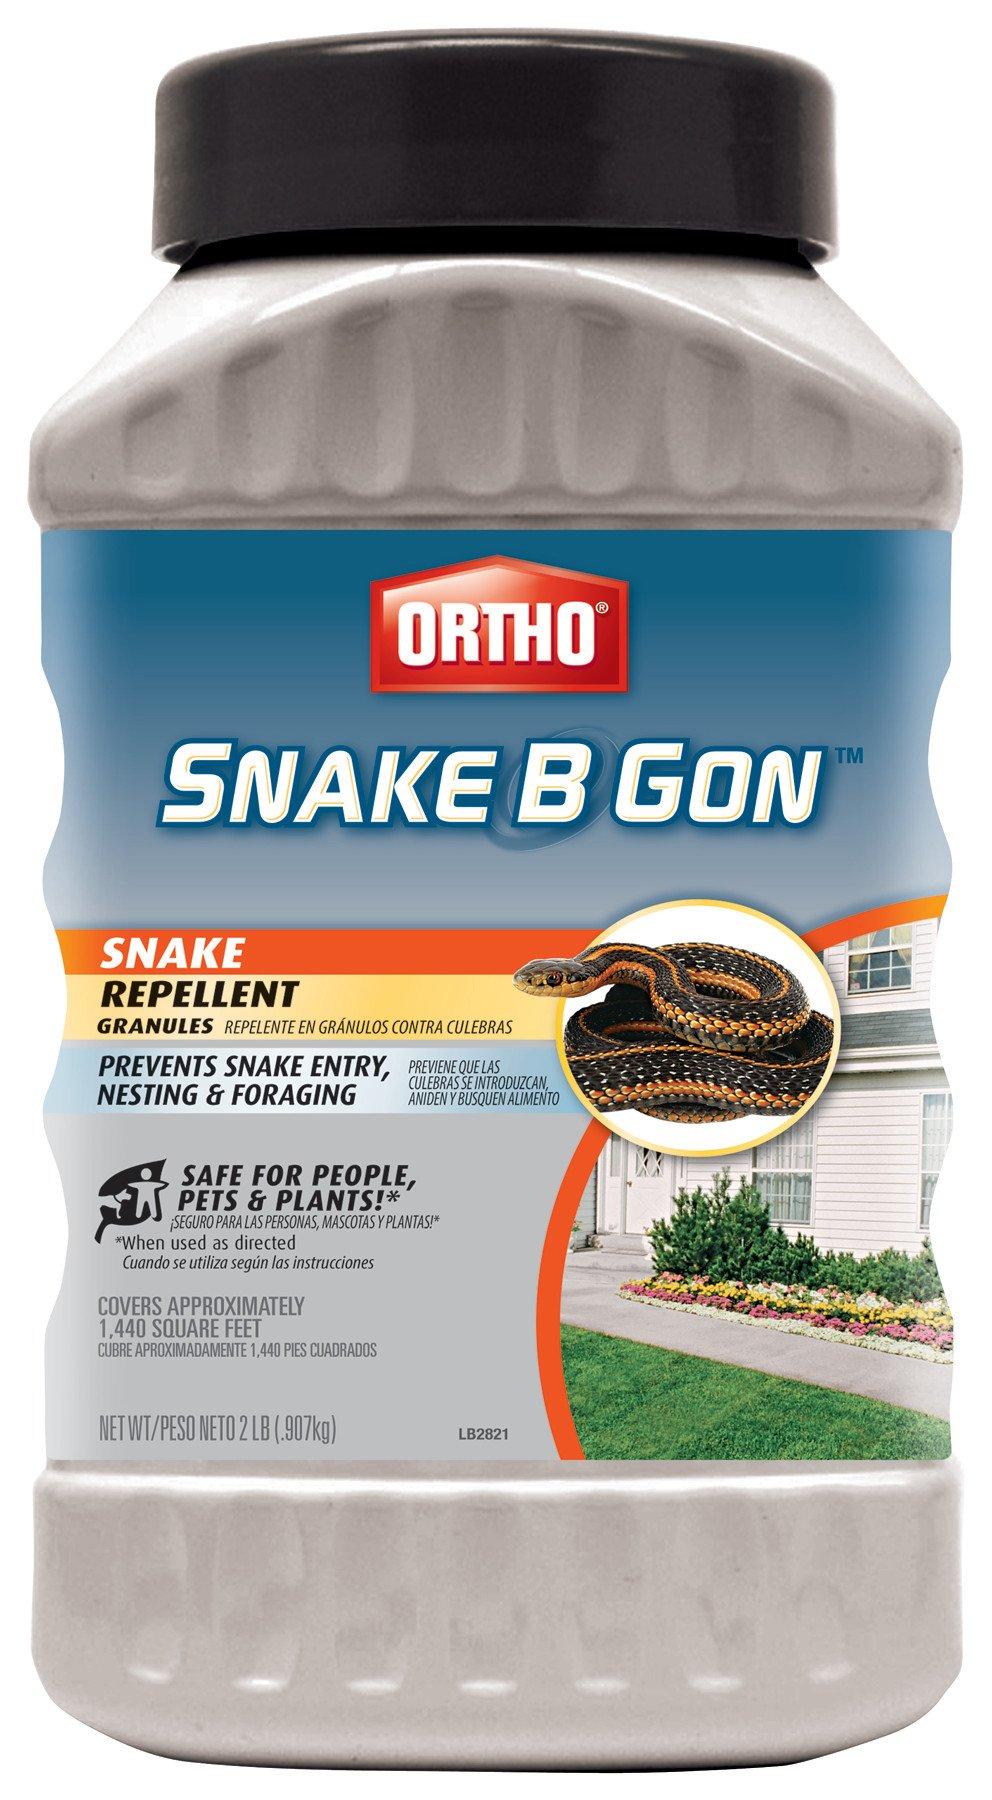 Ortho Snake B Gon Snake Repellent Granules 2-Pound (Not Sold In Ak) 2 Lb 10